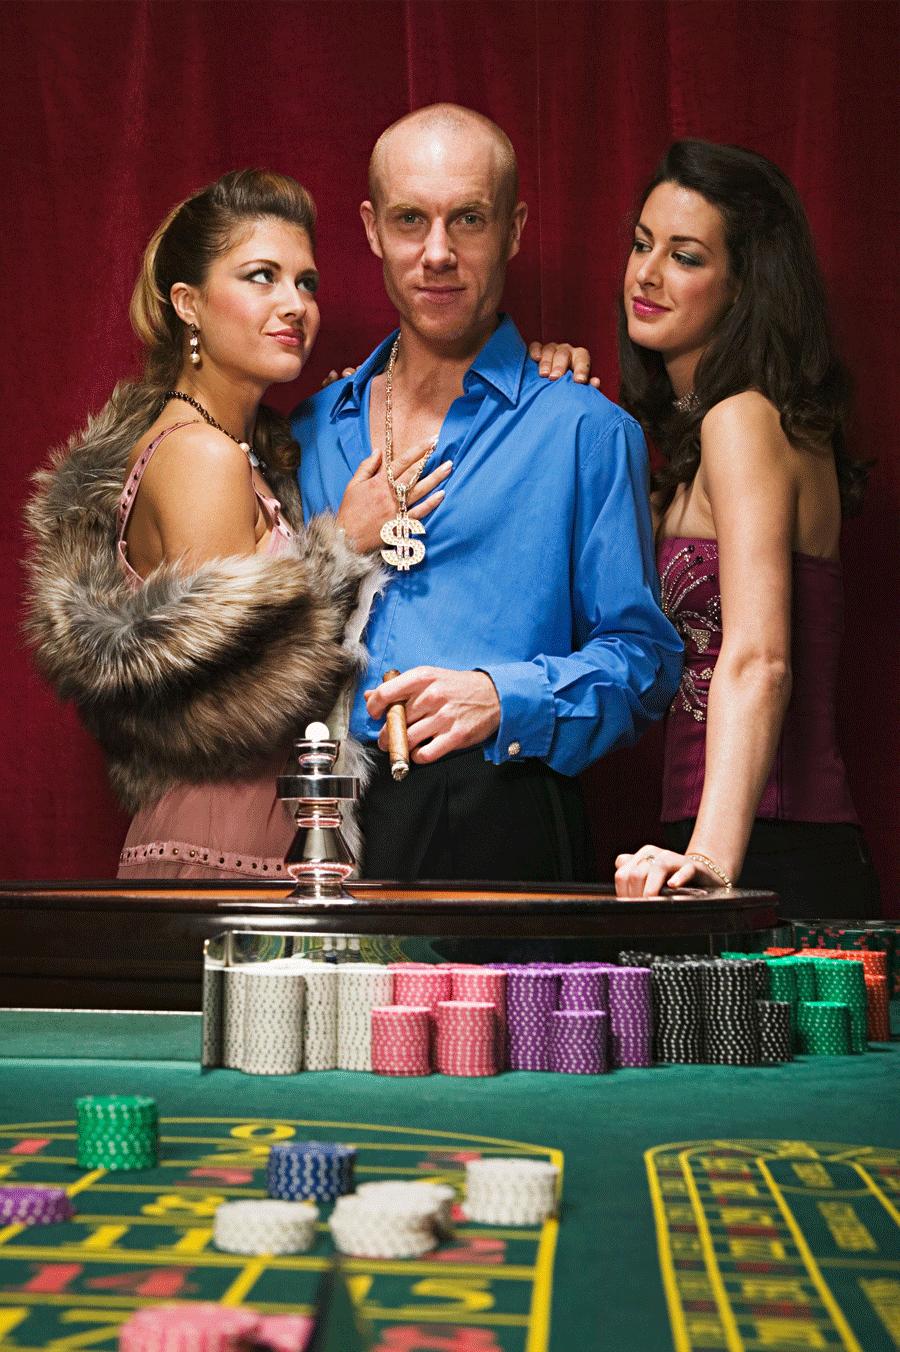 Limo-Parties-Casino-Runs-on-sale-in-Lodi-and-Stockton